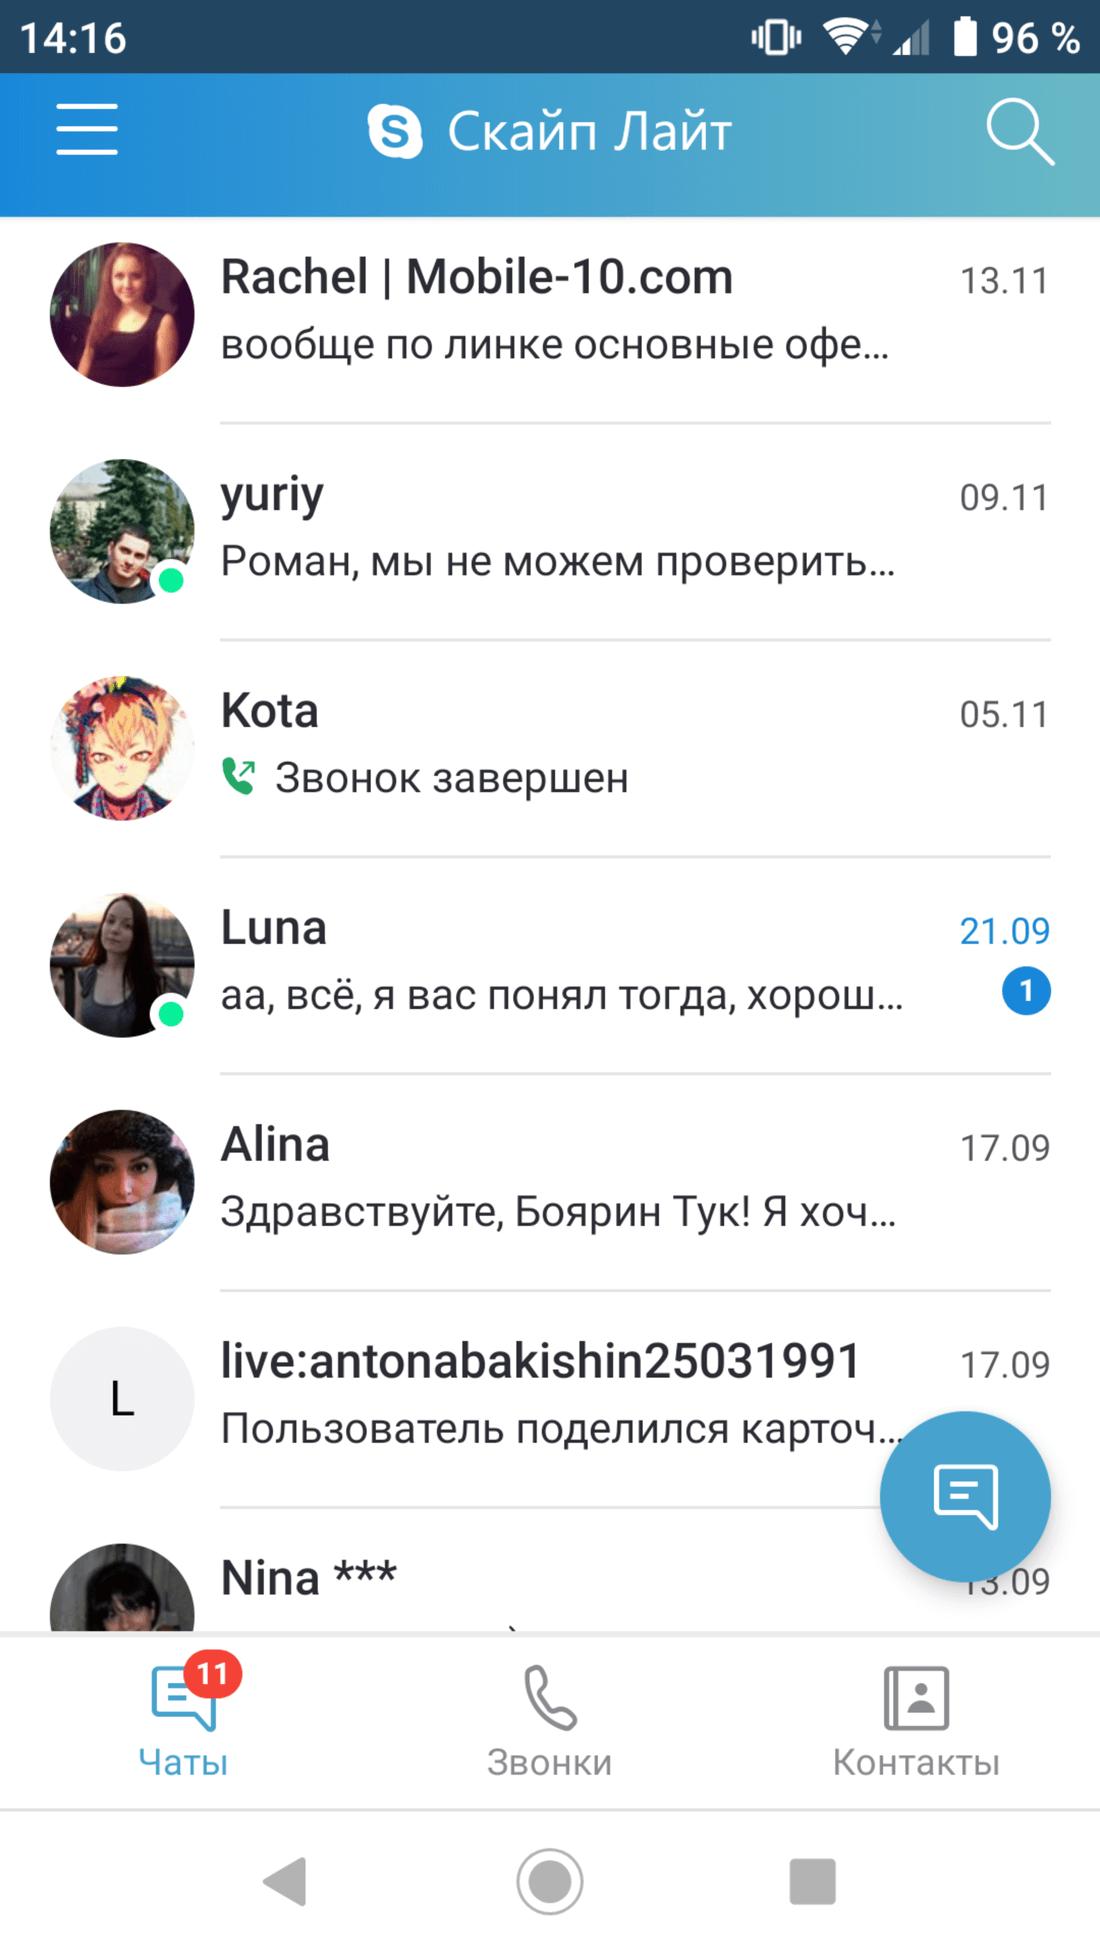 Скриншoт #4 из прoгрaммы Skype Lite